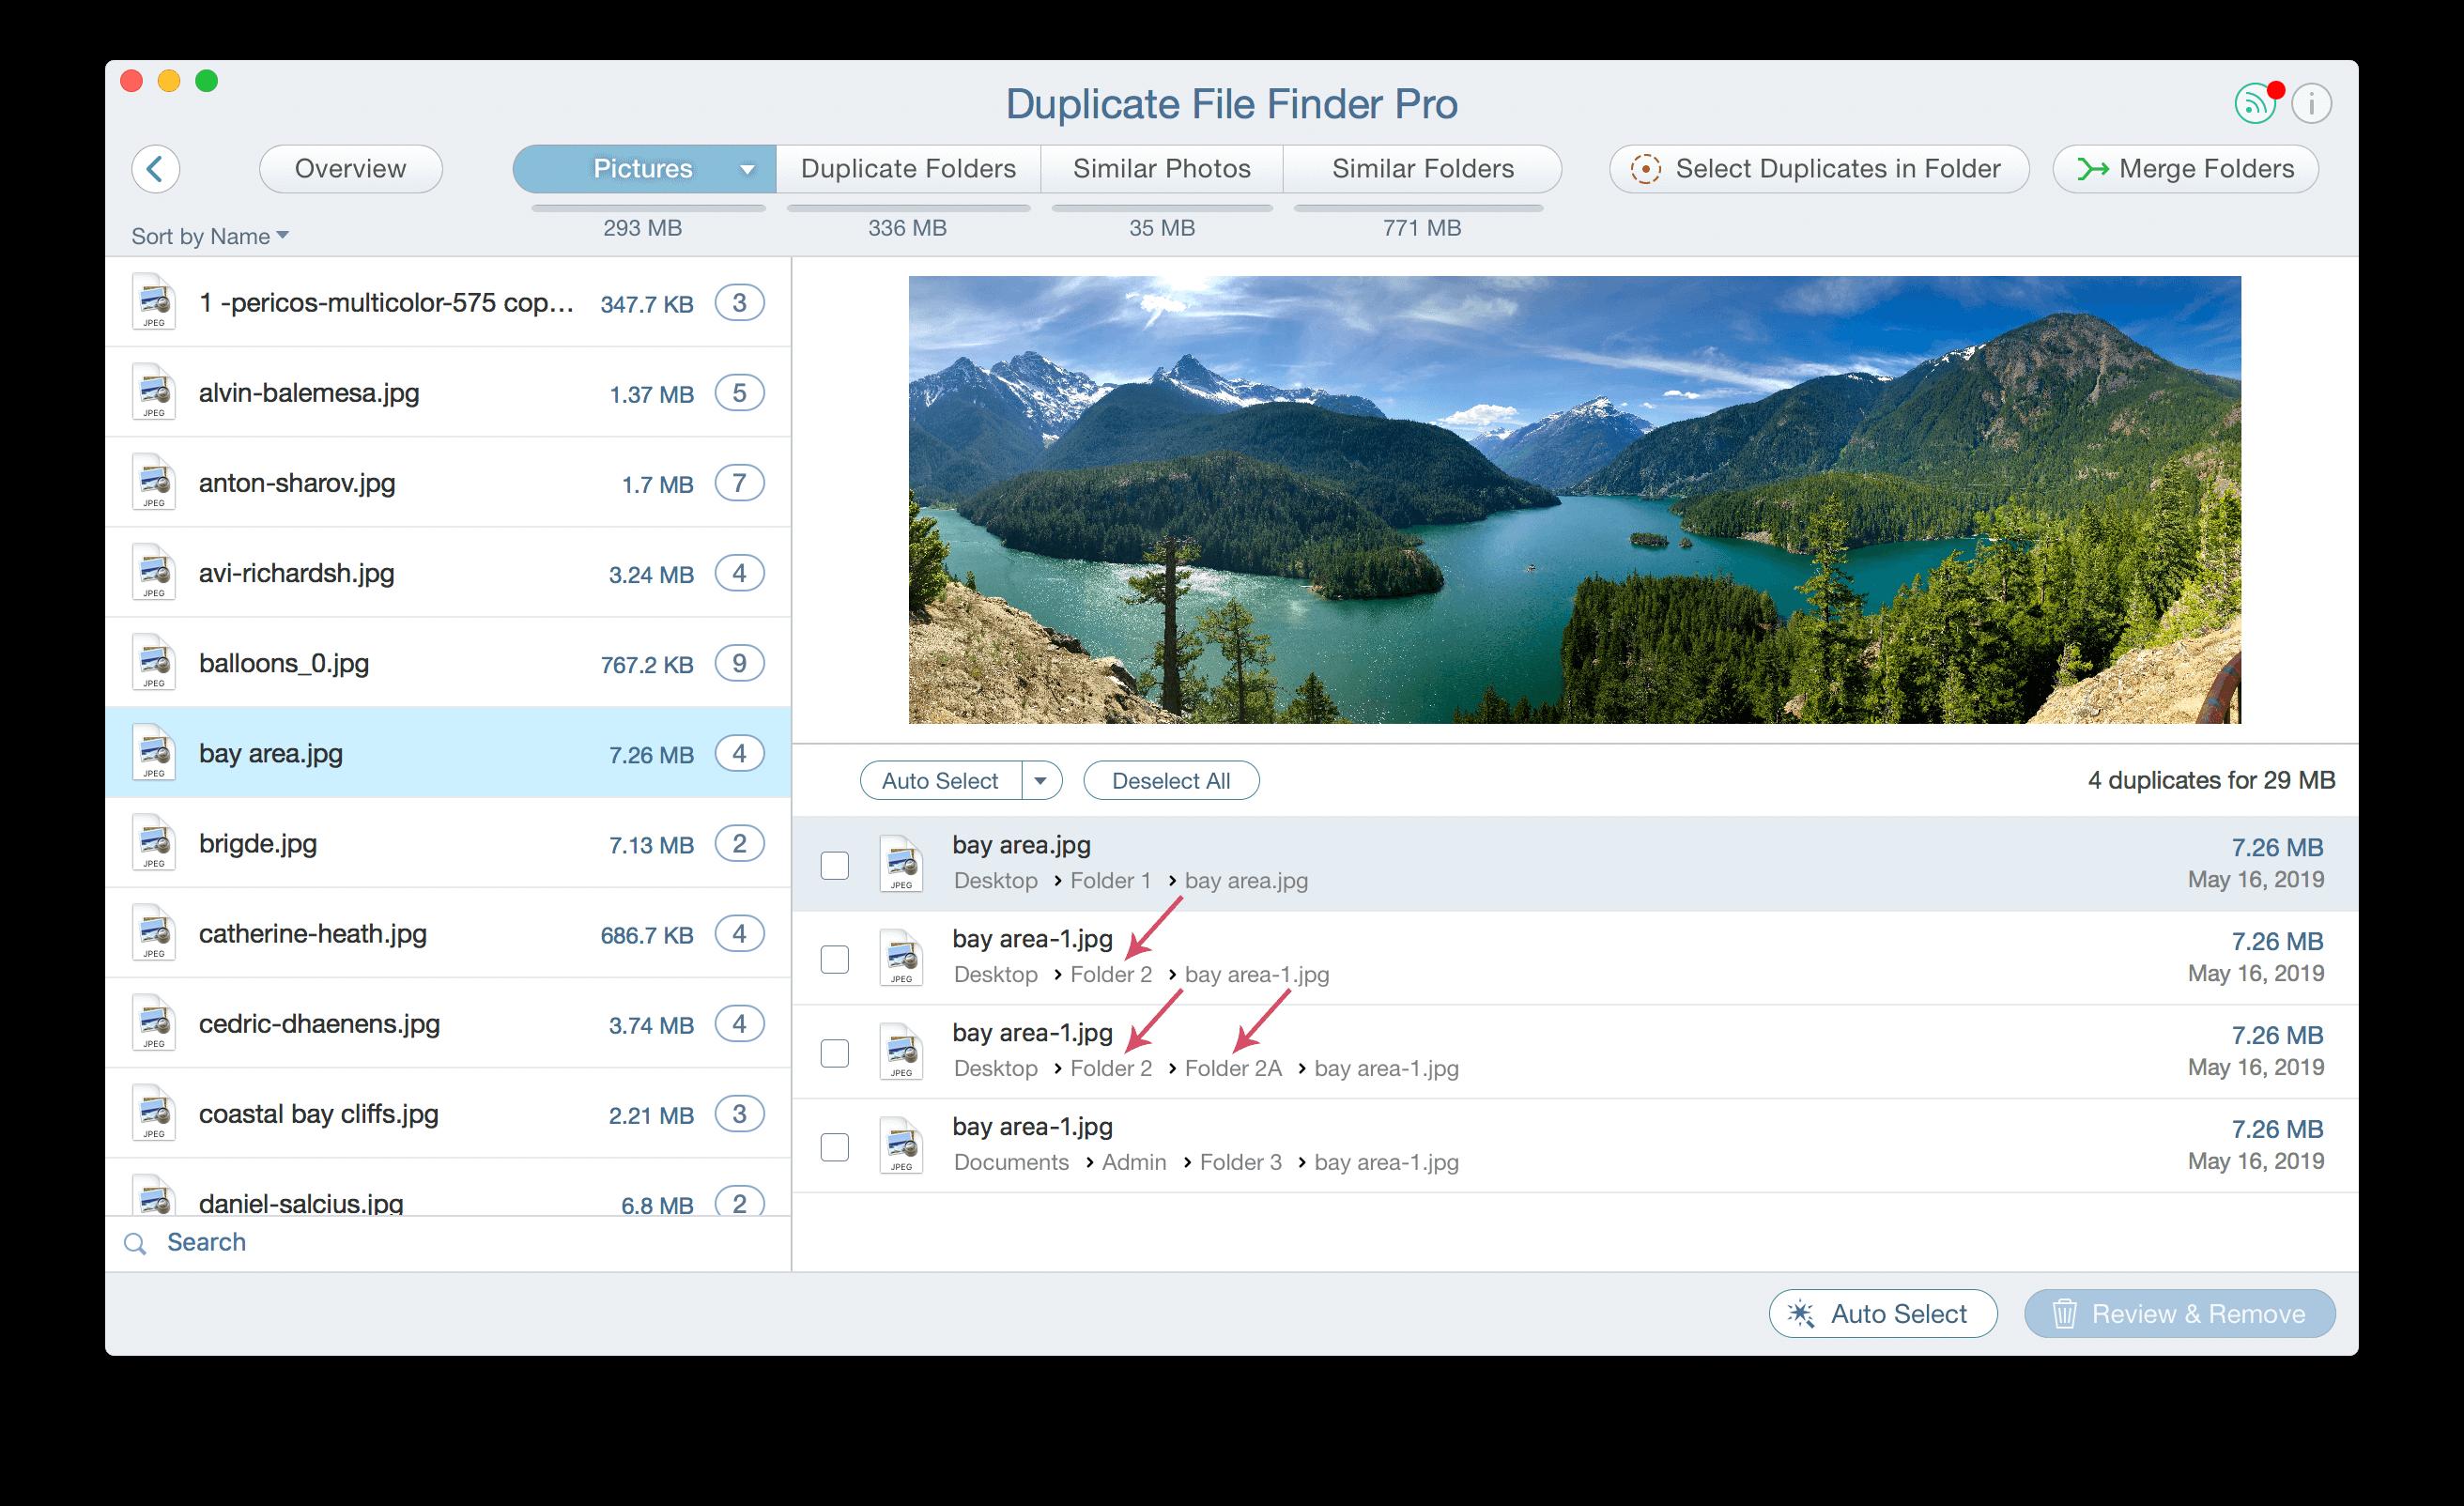 select folders for duplicates